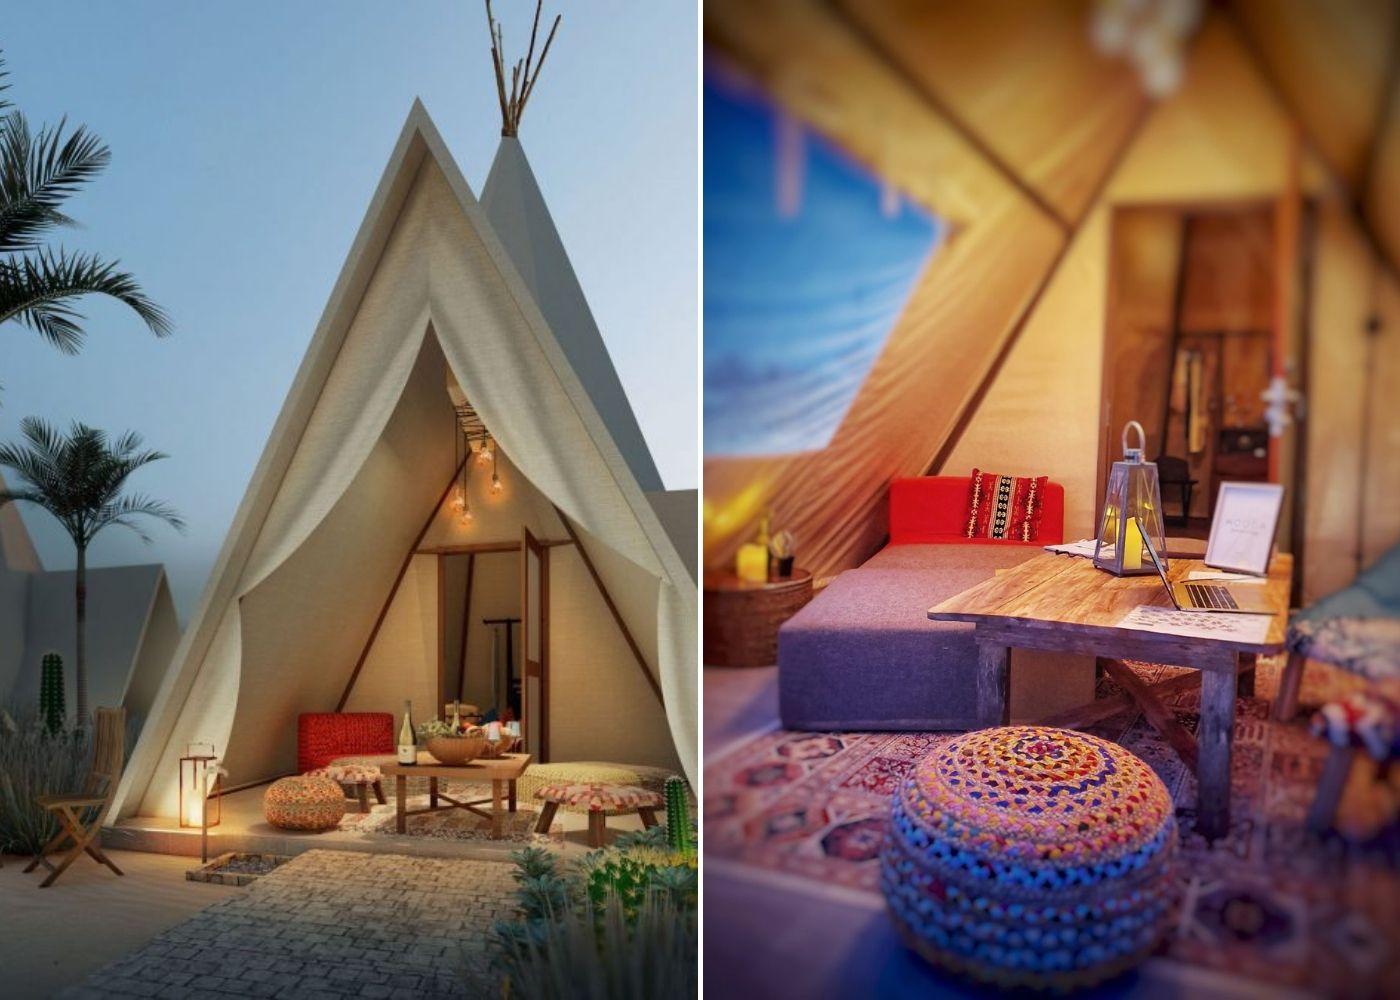 Anmon-Bintan-desert-themed-glamping-resort